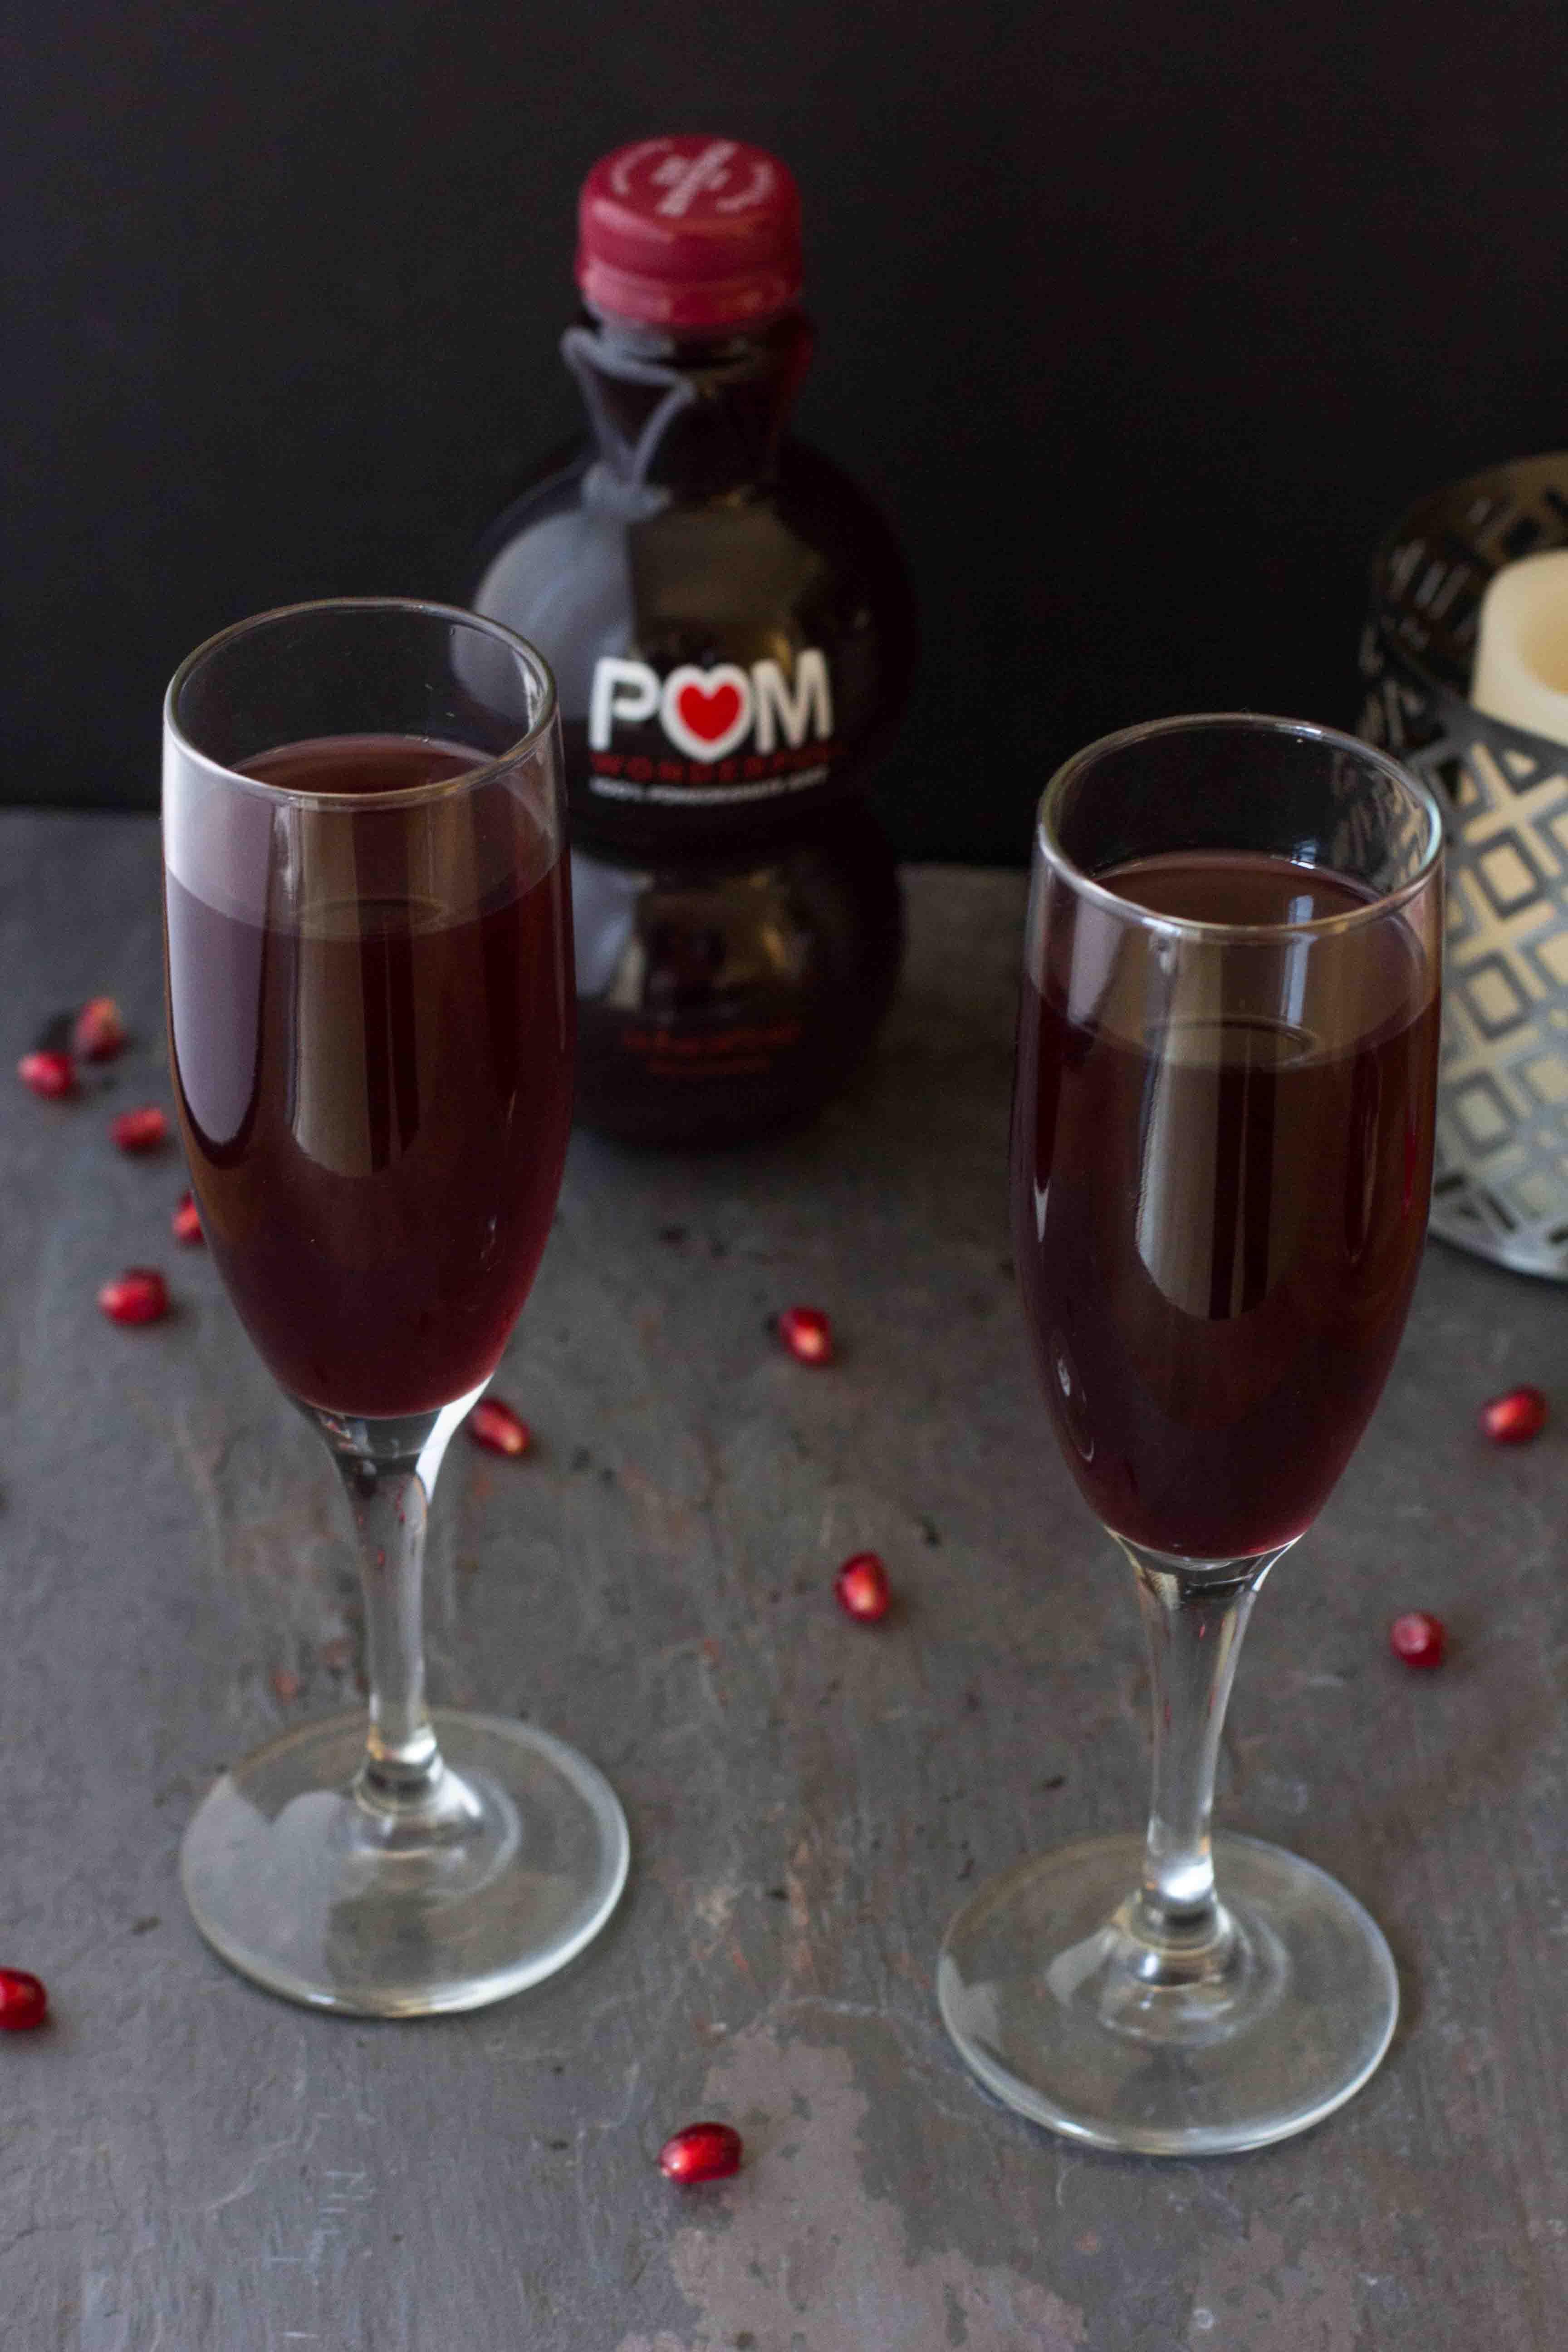 how to drink pom pomegranate juice